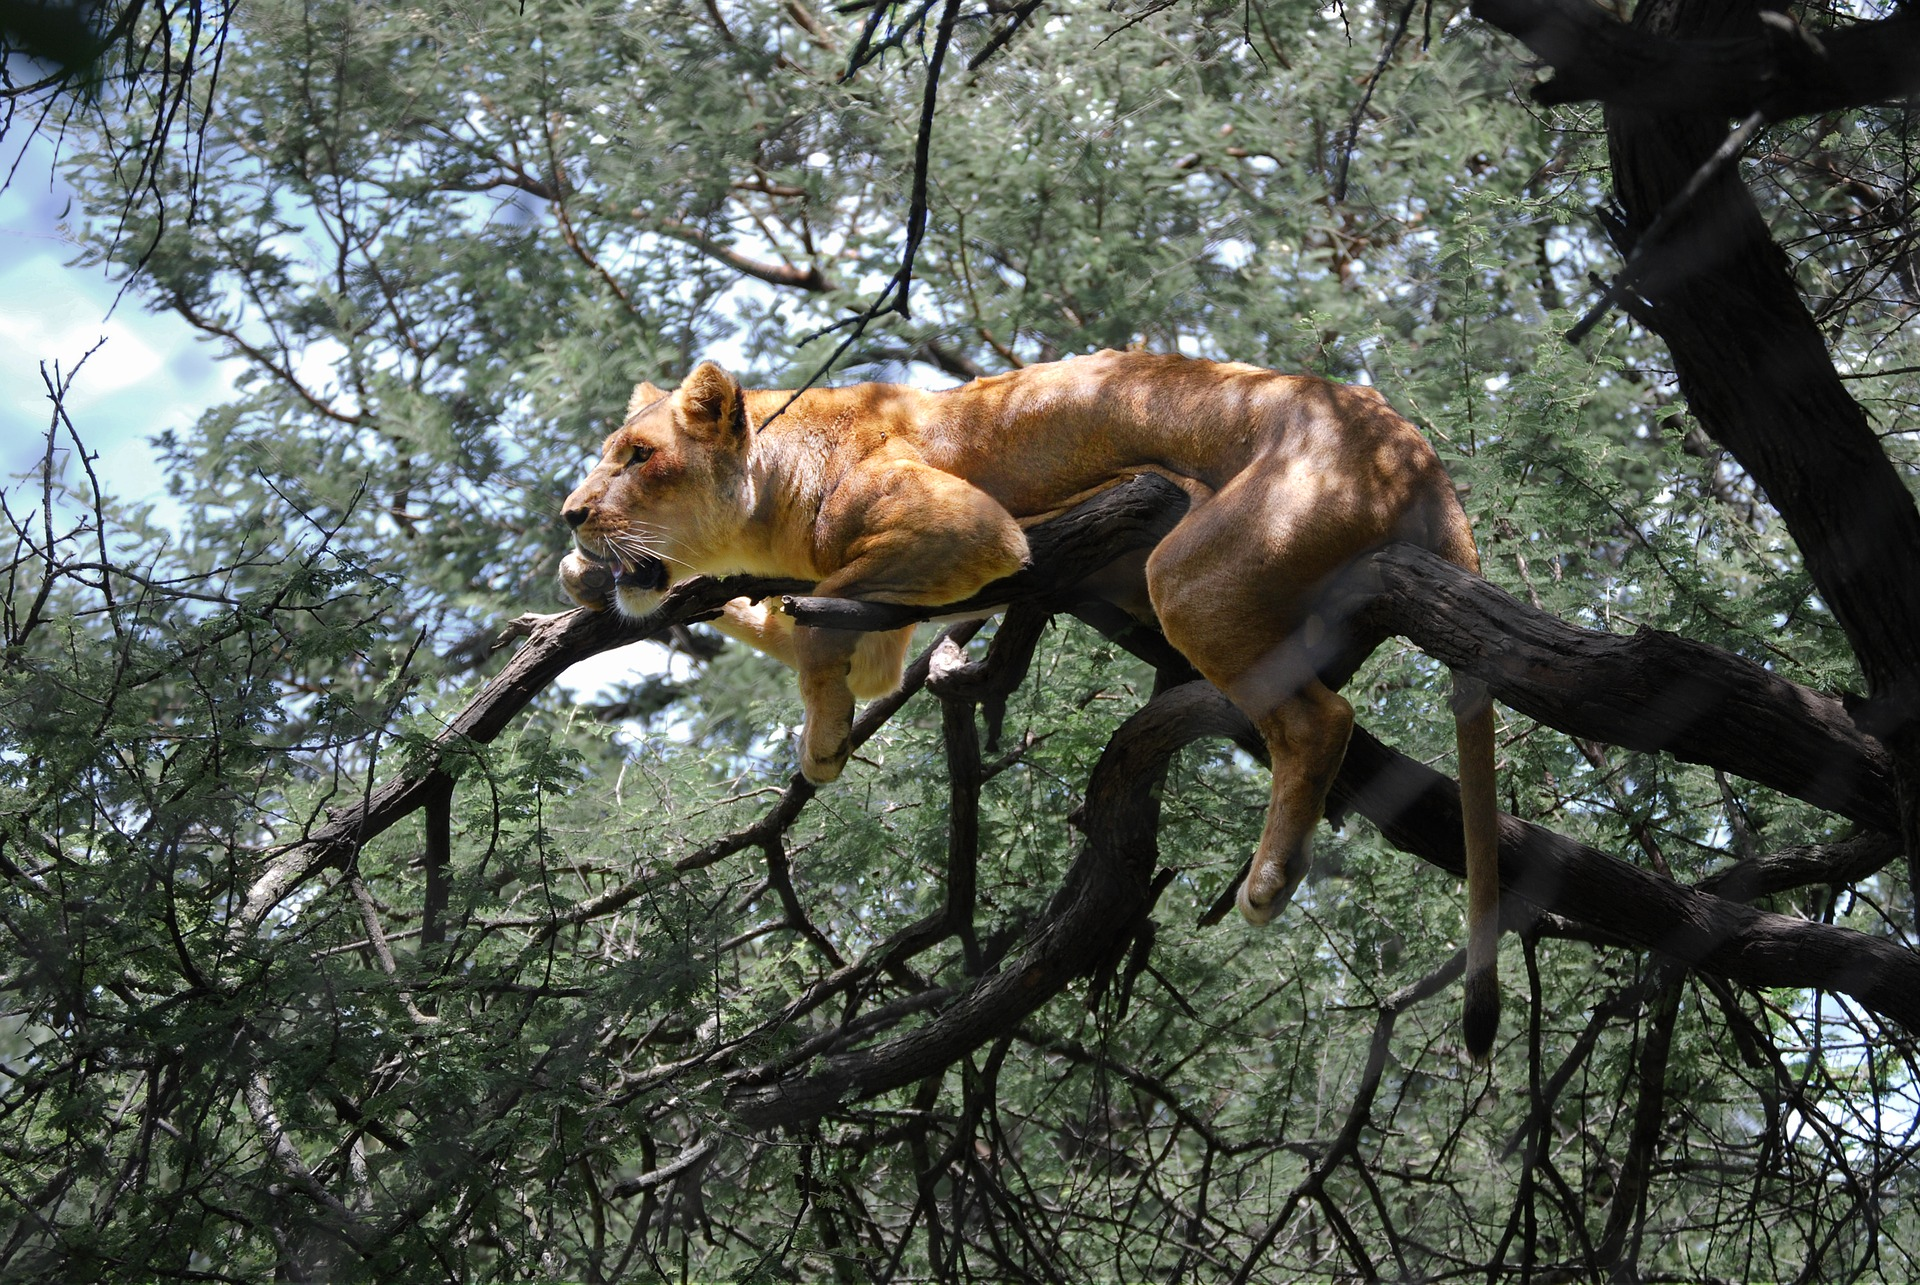 Lion in a tree in Zimbabwe